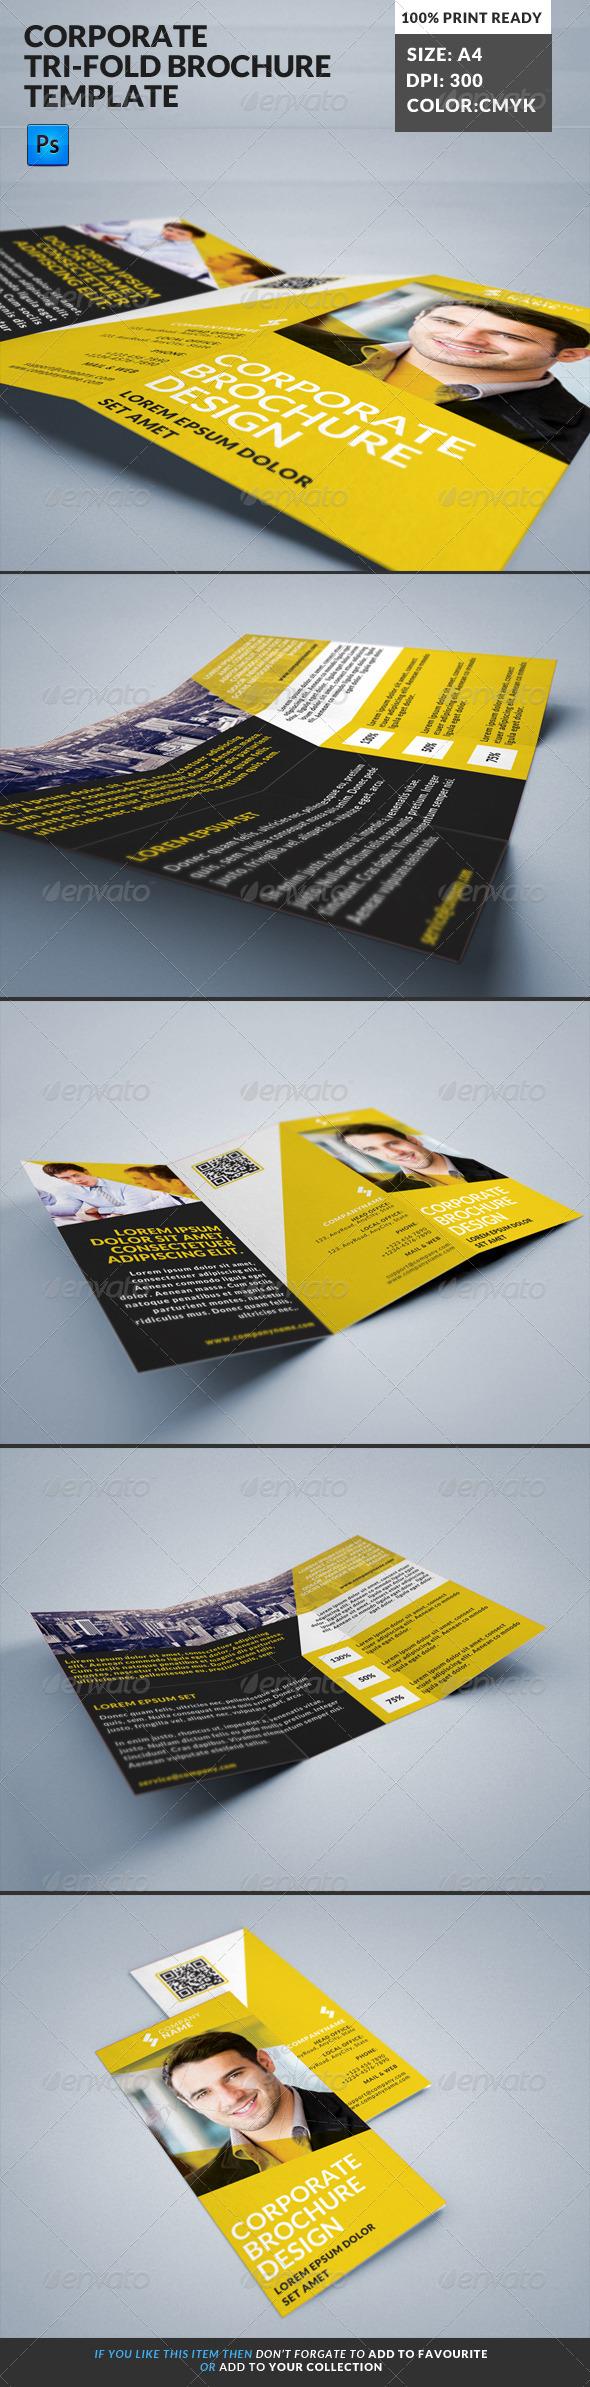 GraphicRiver Corporate Tri-Fold Brochures Template 12 8124365